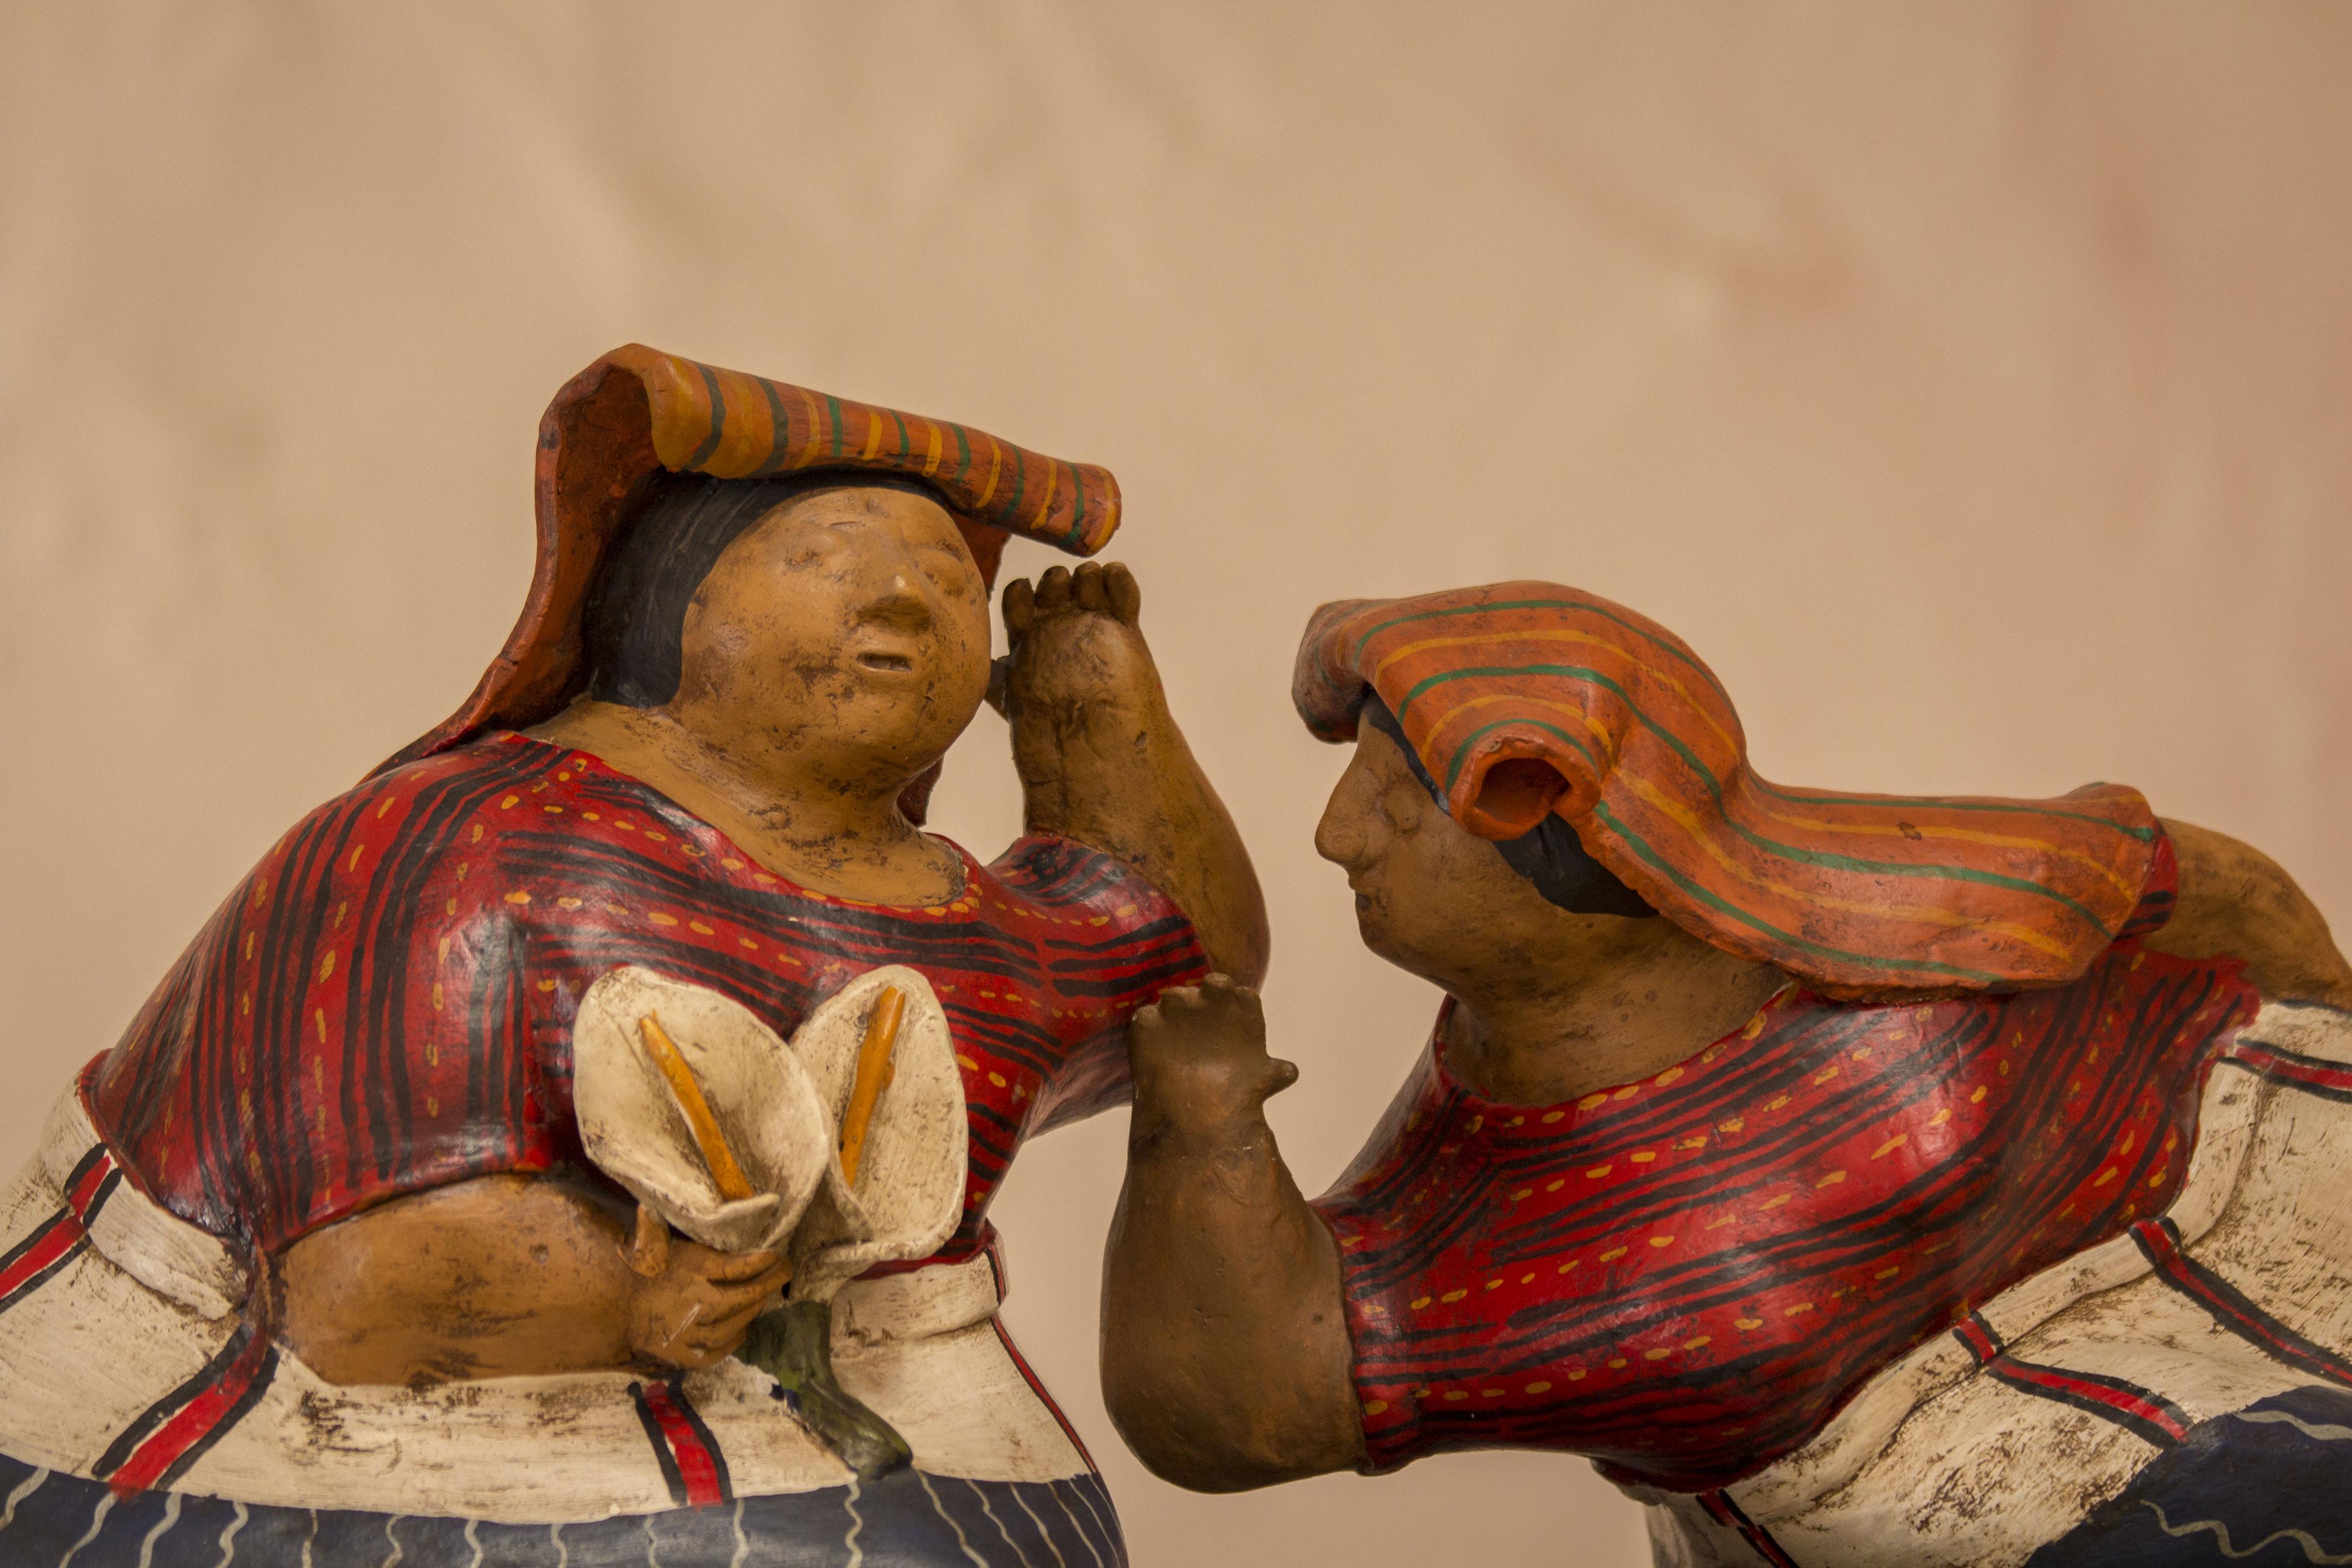 Arts Culture And Entertainment Comadres Gossip Gossip Girl Guatemalan Crafts Guatemalan Indigenous People Handycraft Sculpture Statue